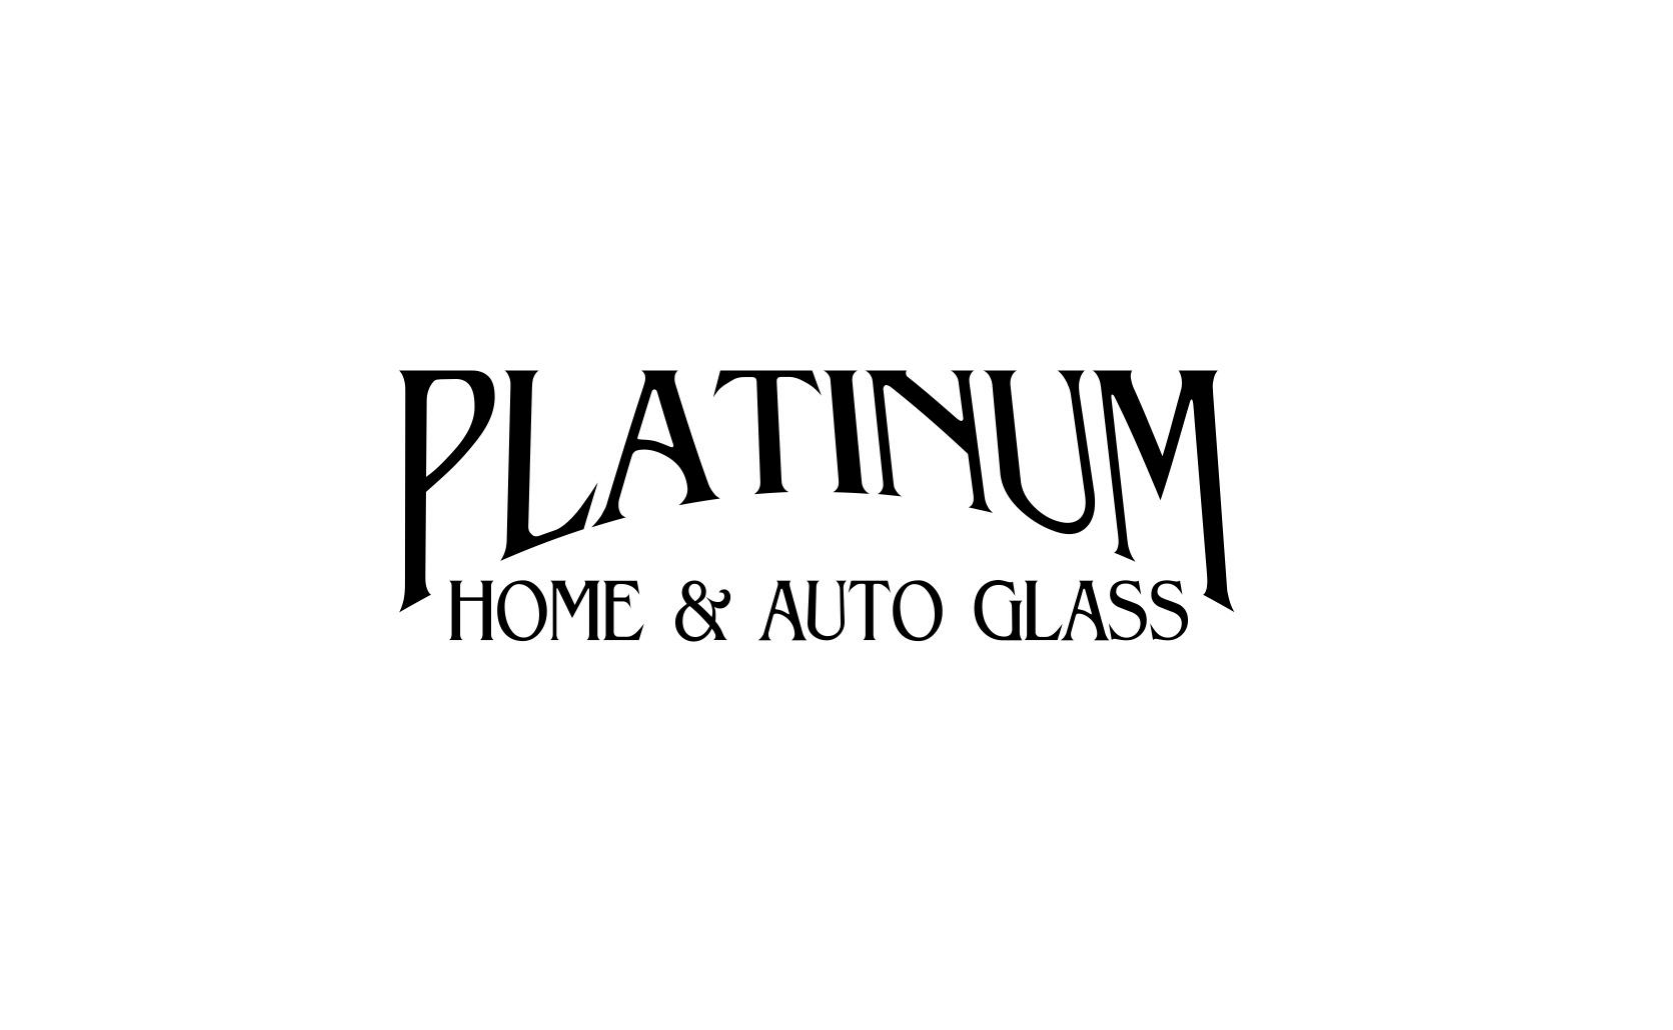 https://hawkmazzottamotocamp.com/wp-content/uploads/2021/03/Sponsor_Platinum_Auto_Glass-edited.png